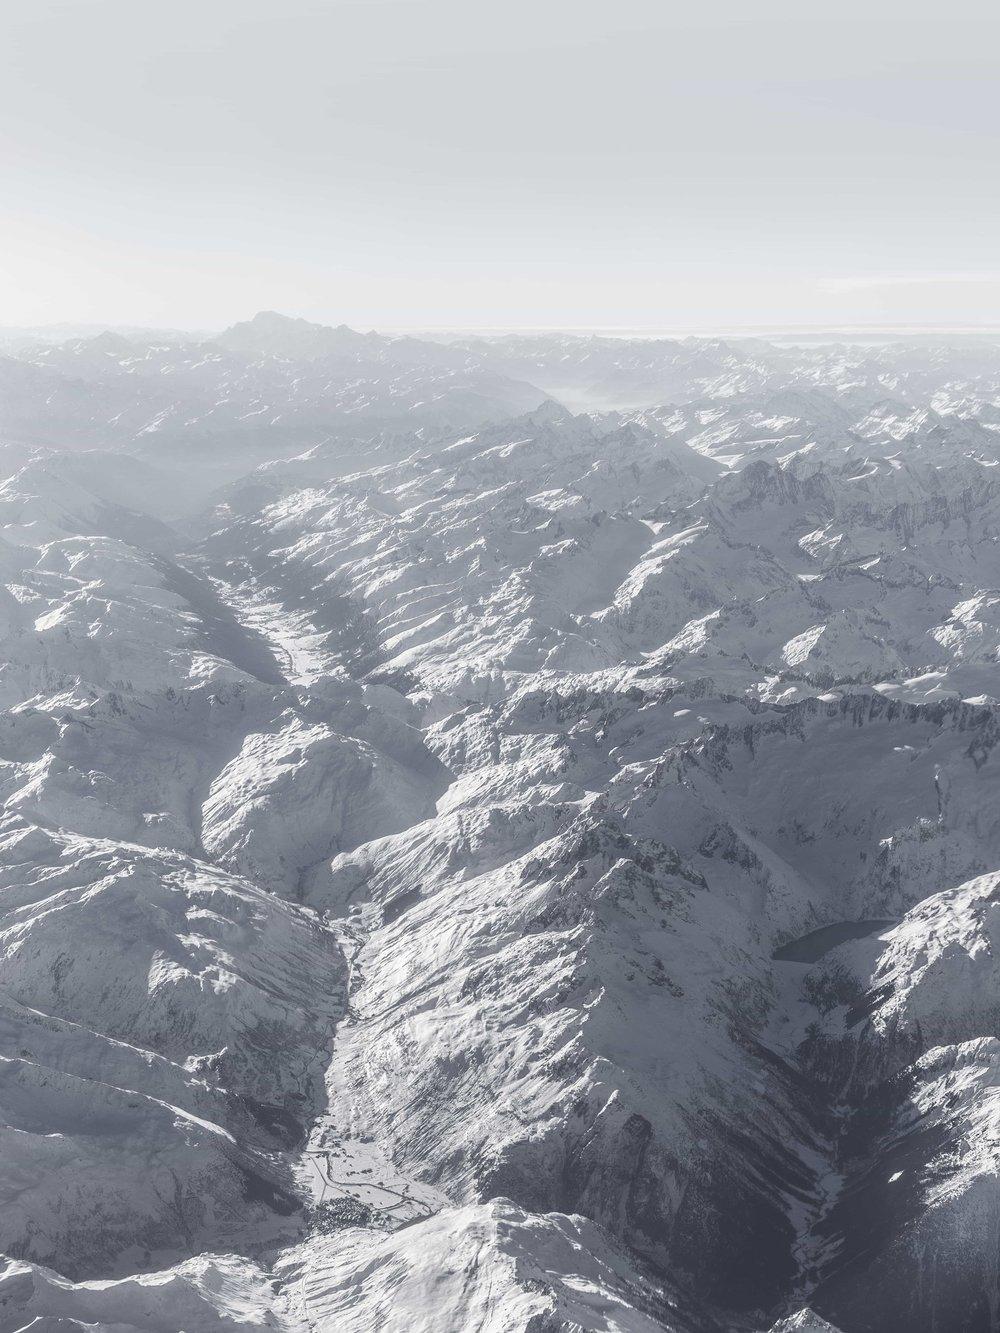 aerial_landscape_photography_fabio_burrelli_photographer_17.jpg